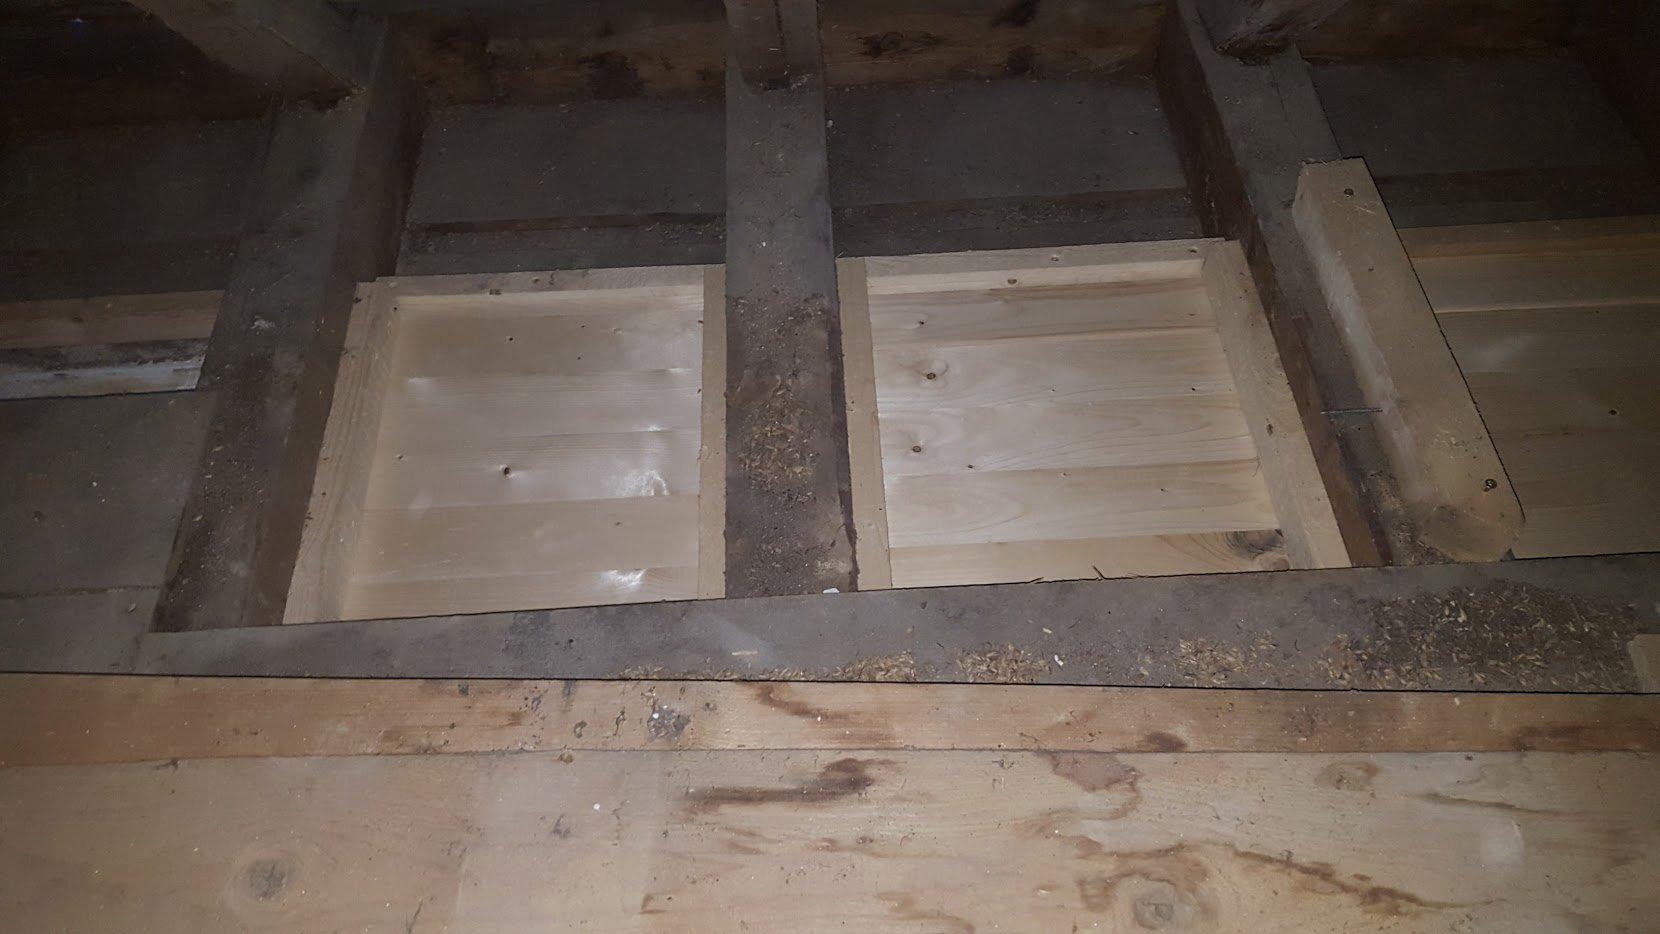 Dachboden Fußboden Nachträglich Dämmen ~ Fußboden dämmen dachboden wie dämmt man ein dach selber